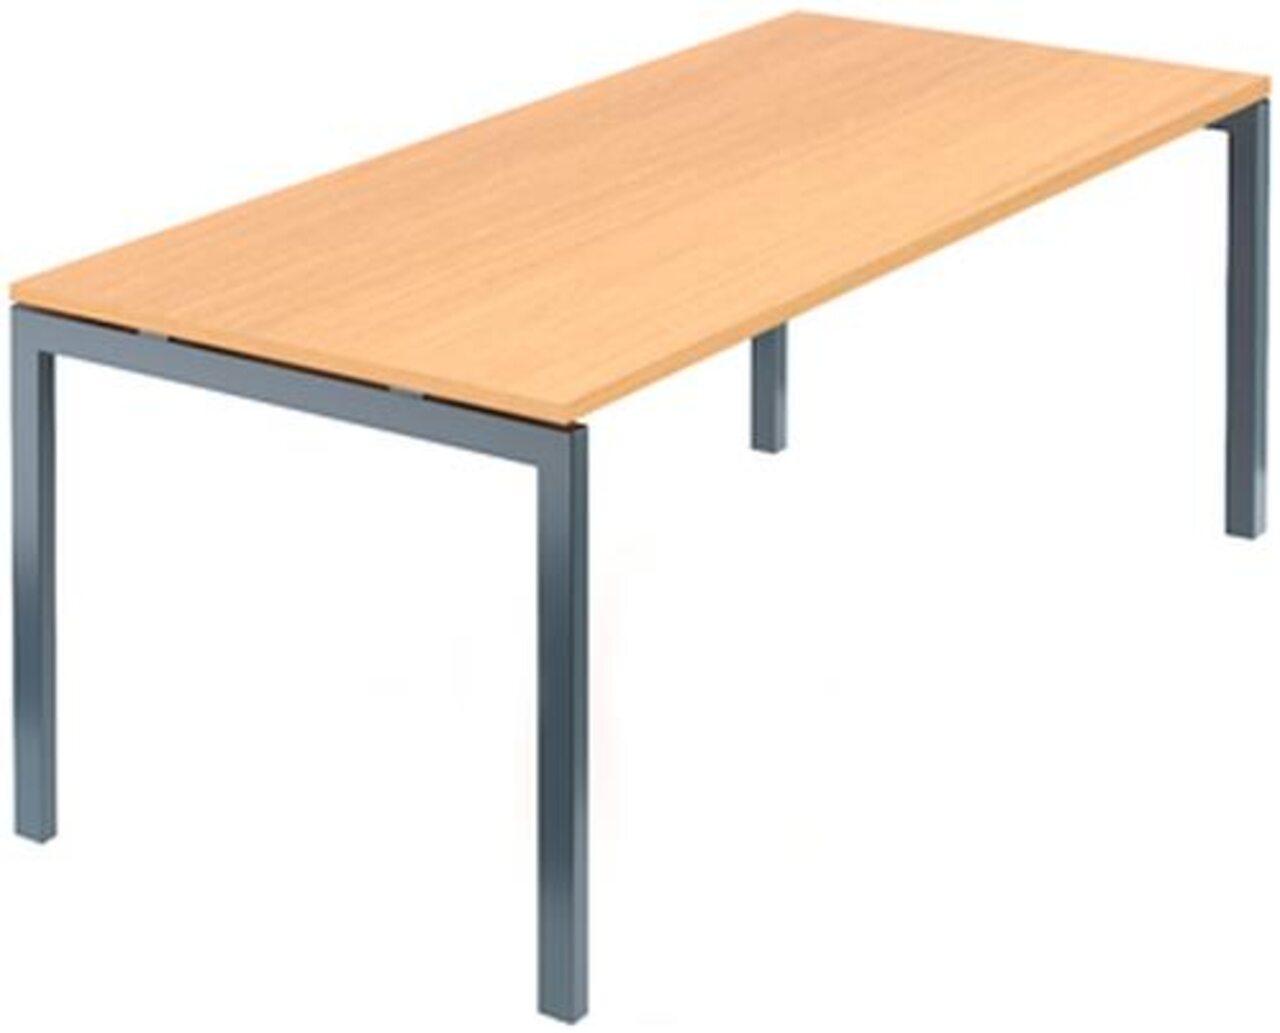 Стол на м/каркасе для заседаний/антрацит Арго 180x85x76 - фото 7